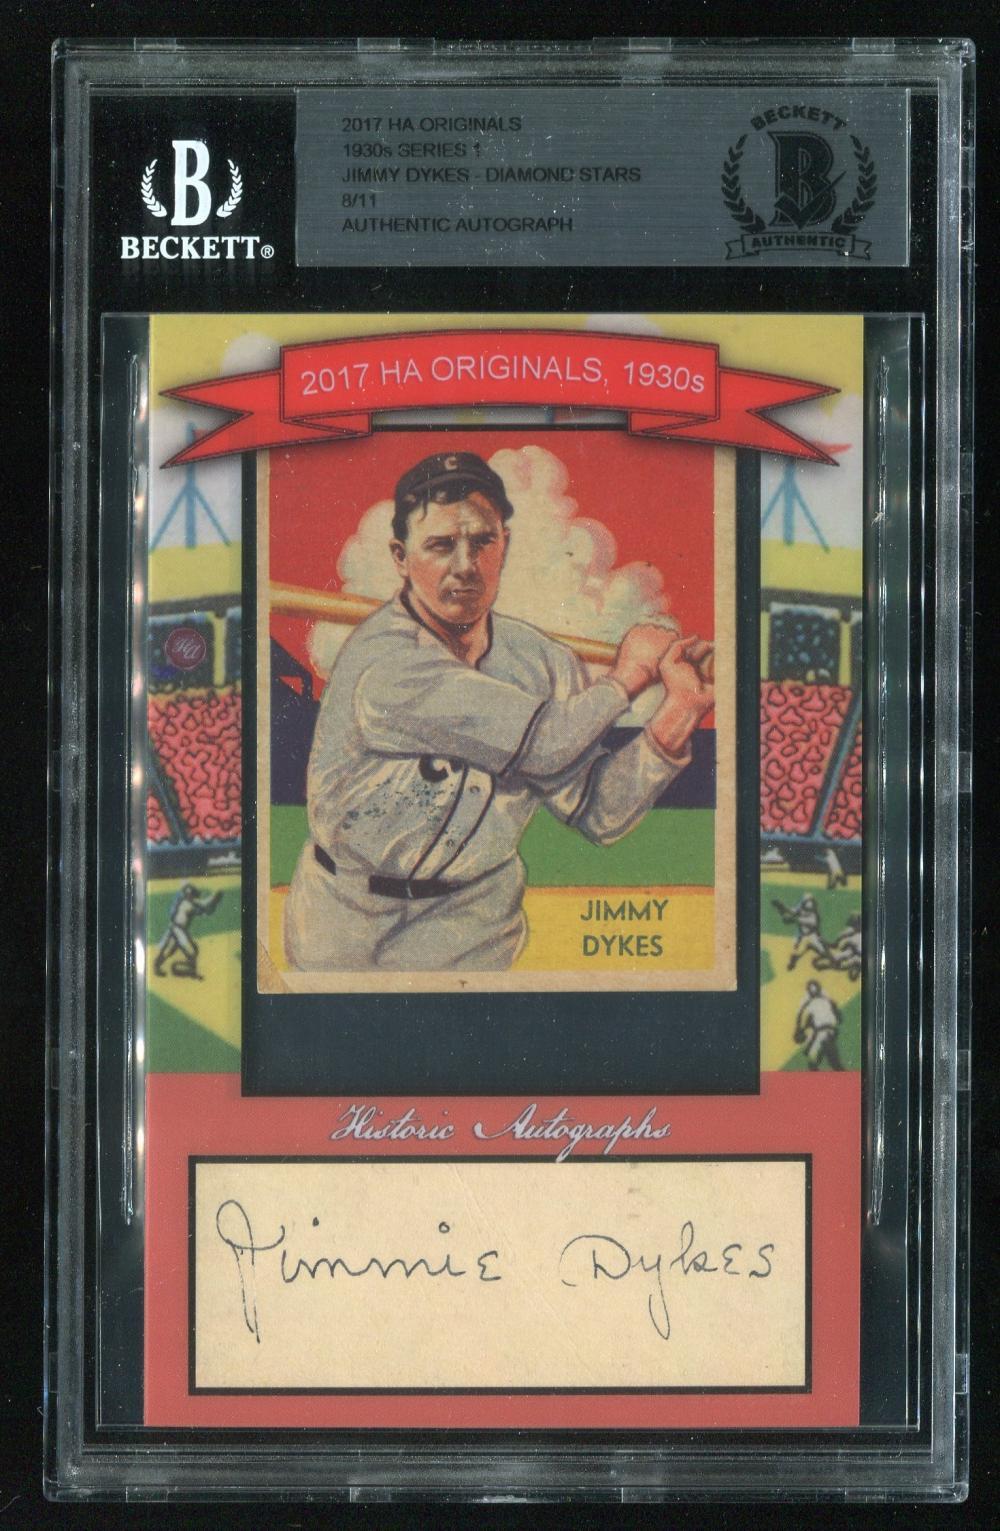 1935 Diamond Stars Jimmy Dykes 42 With Signature Cut 811 Beckett